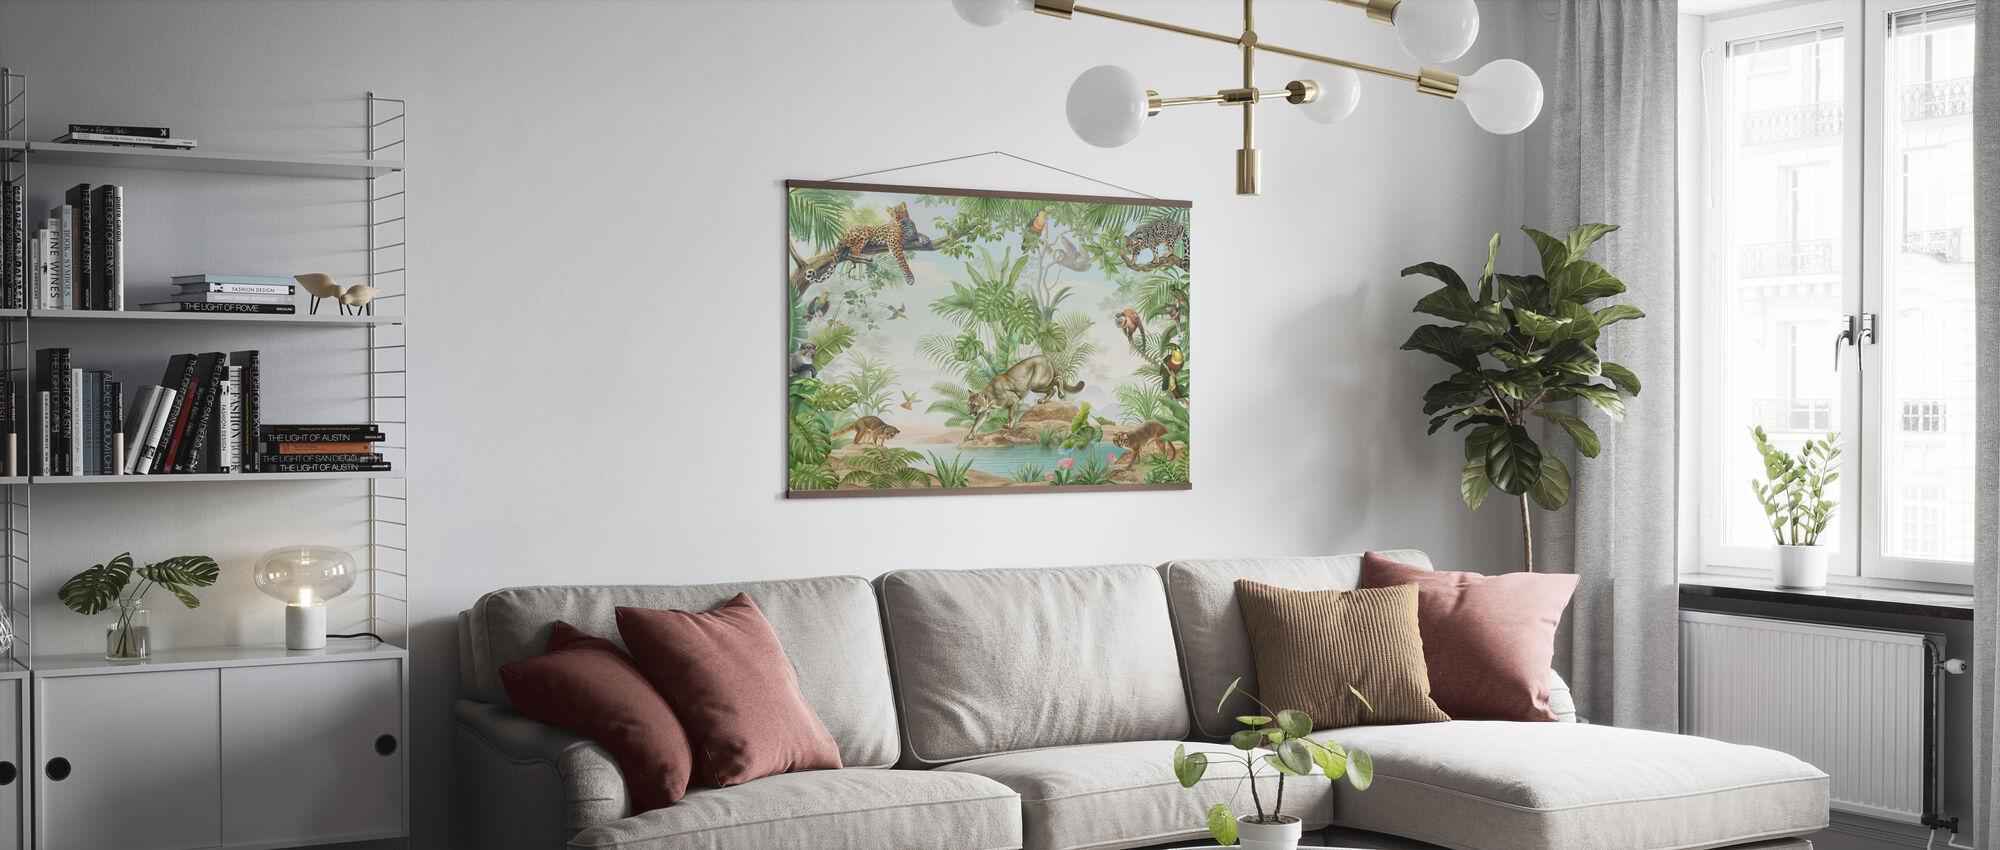 Jungle Hangout - Poster - Living Room